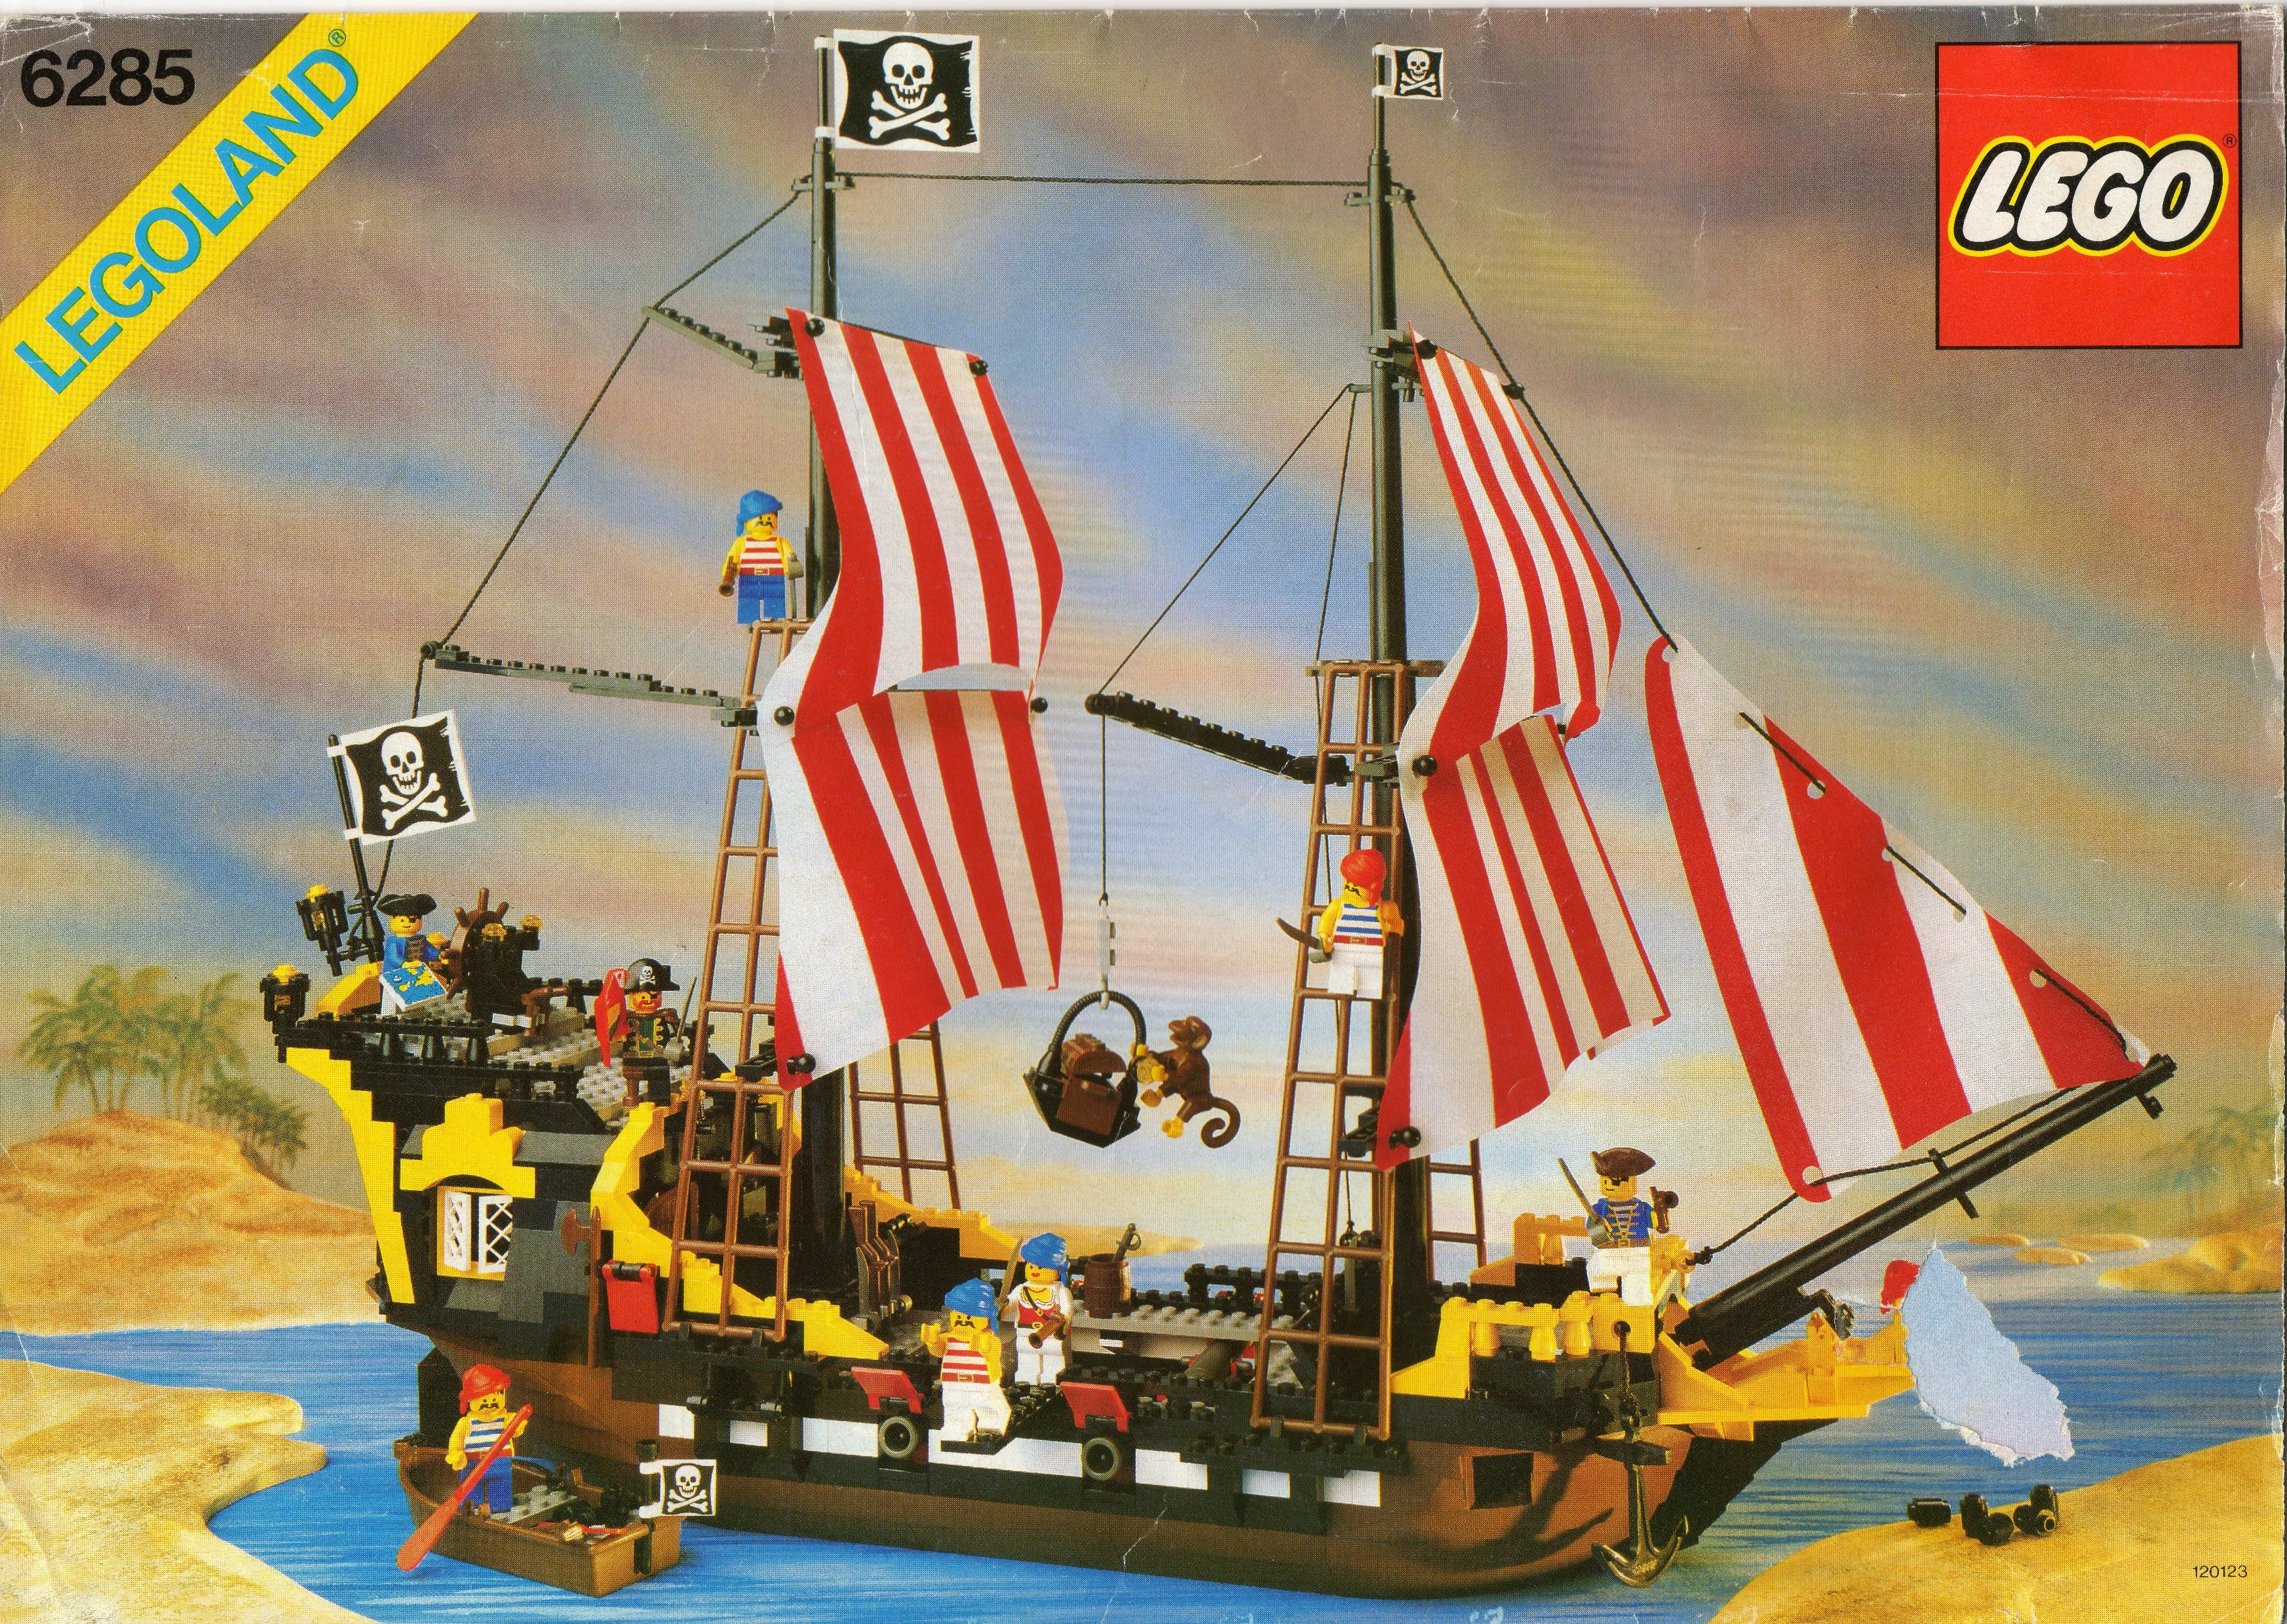 Vintage Lego Yellow 6285 Pirate Ship Parts